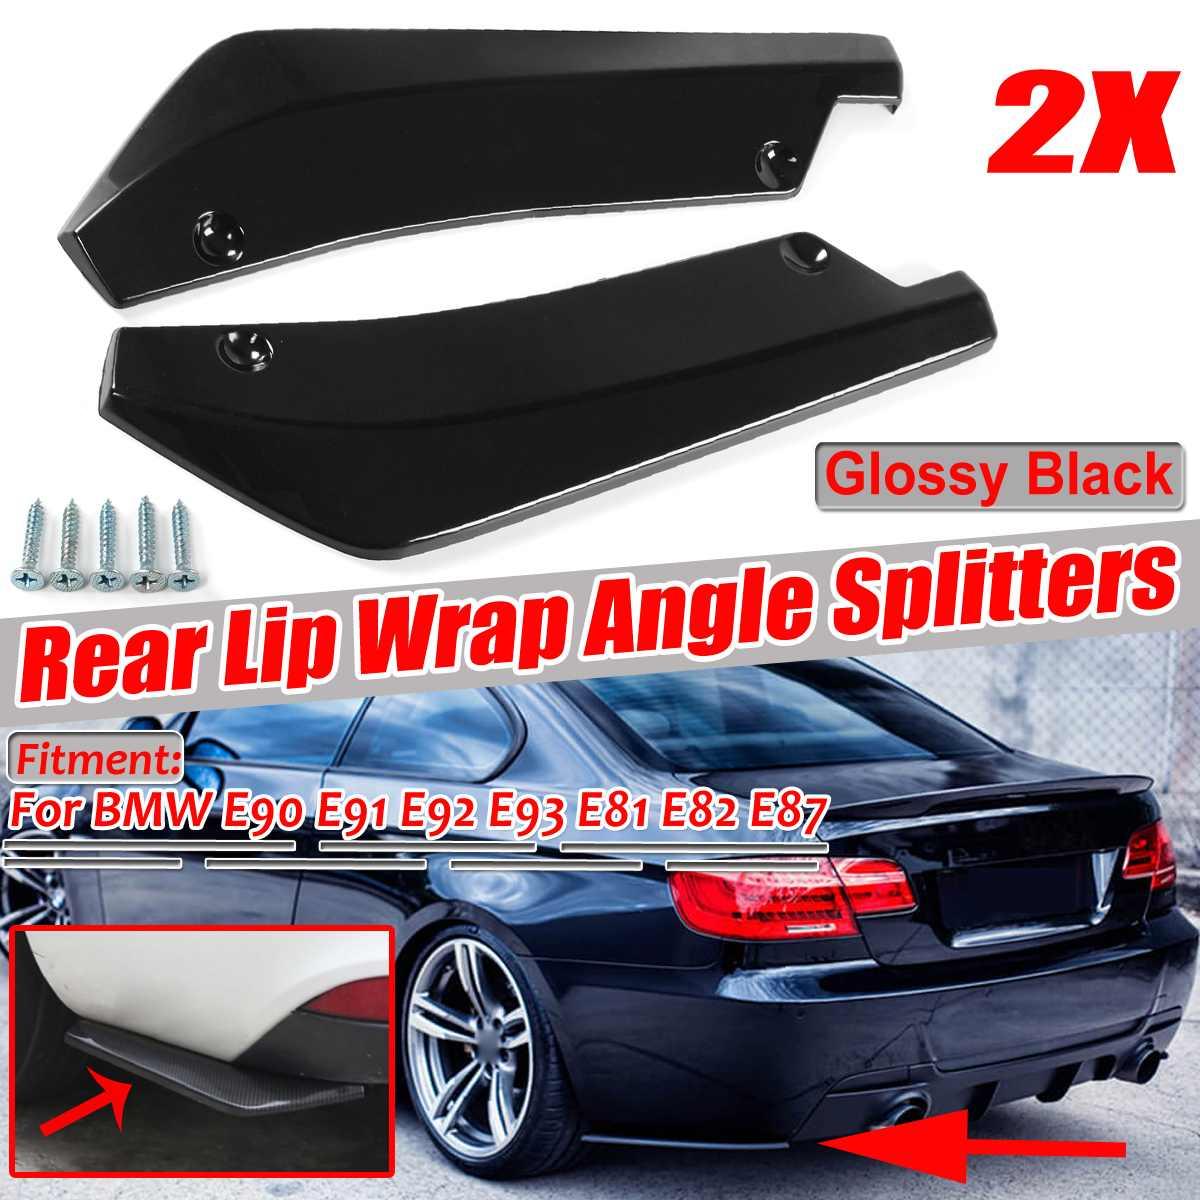 2 protectores universales para difusor de parachoques trasero, divisores de labios para BMW E39 E46 E53 E90 E92 E93 E60 E61 X5 E70 X6 E71, negro brillante